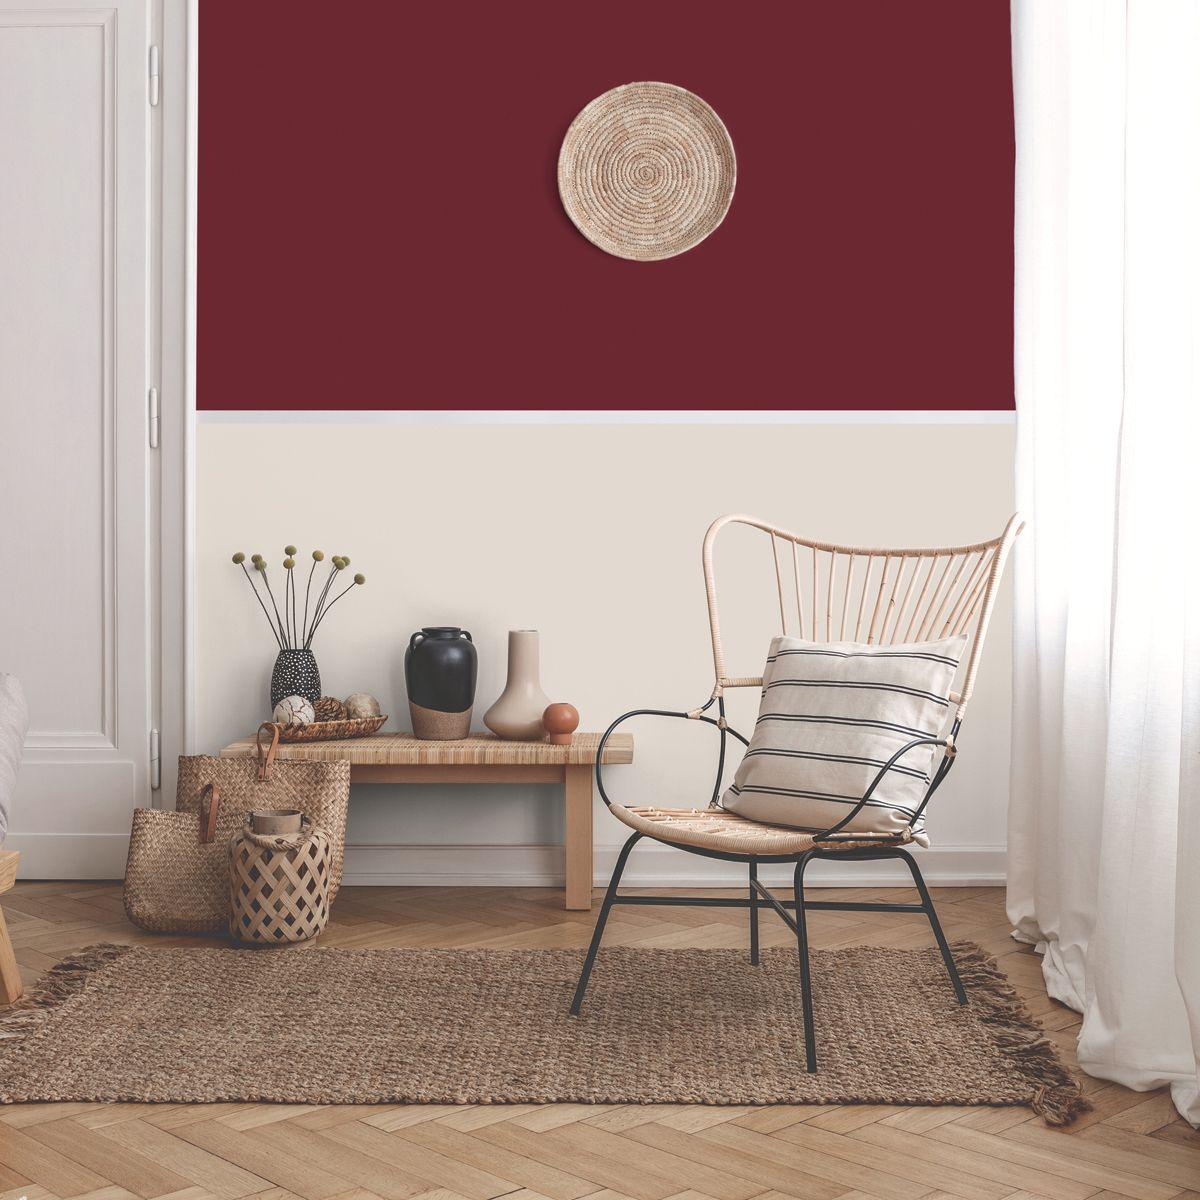 Peinture rouge intense mat 20 minutes chrono Renaulac